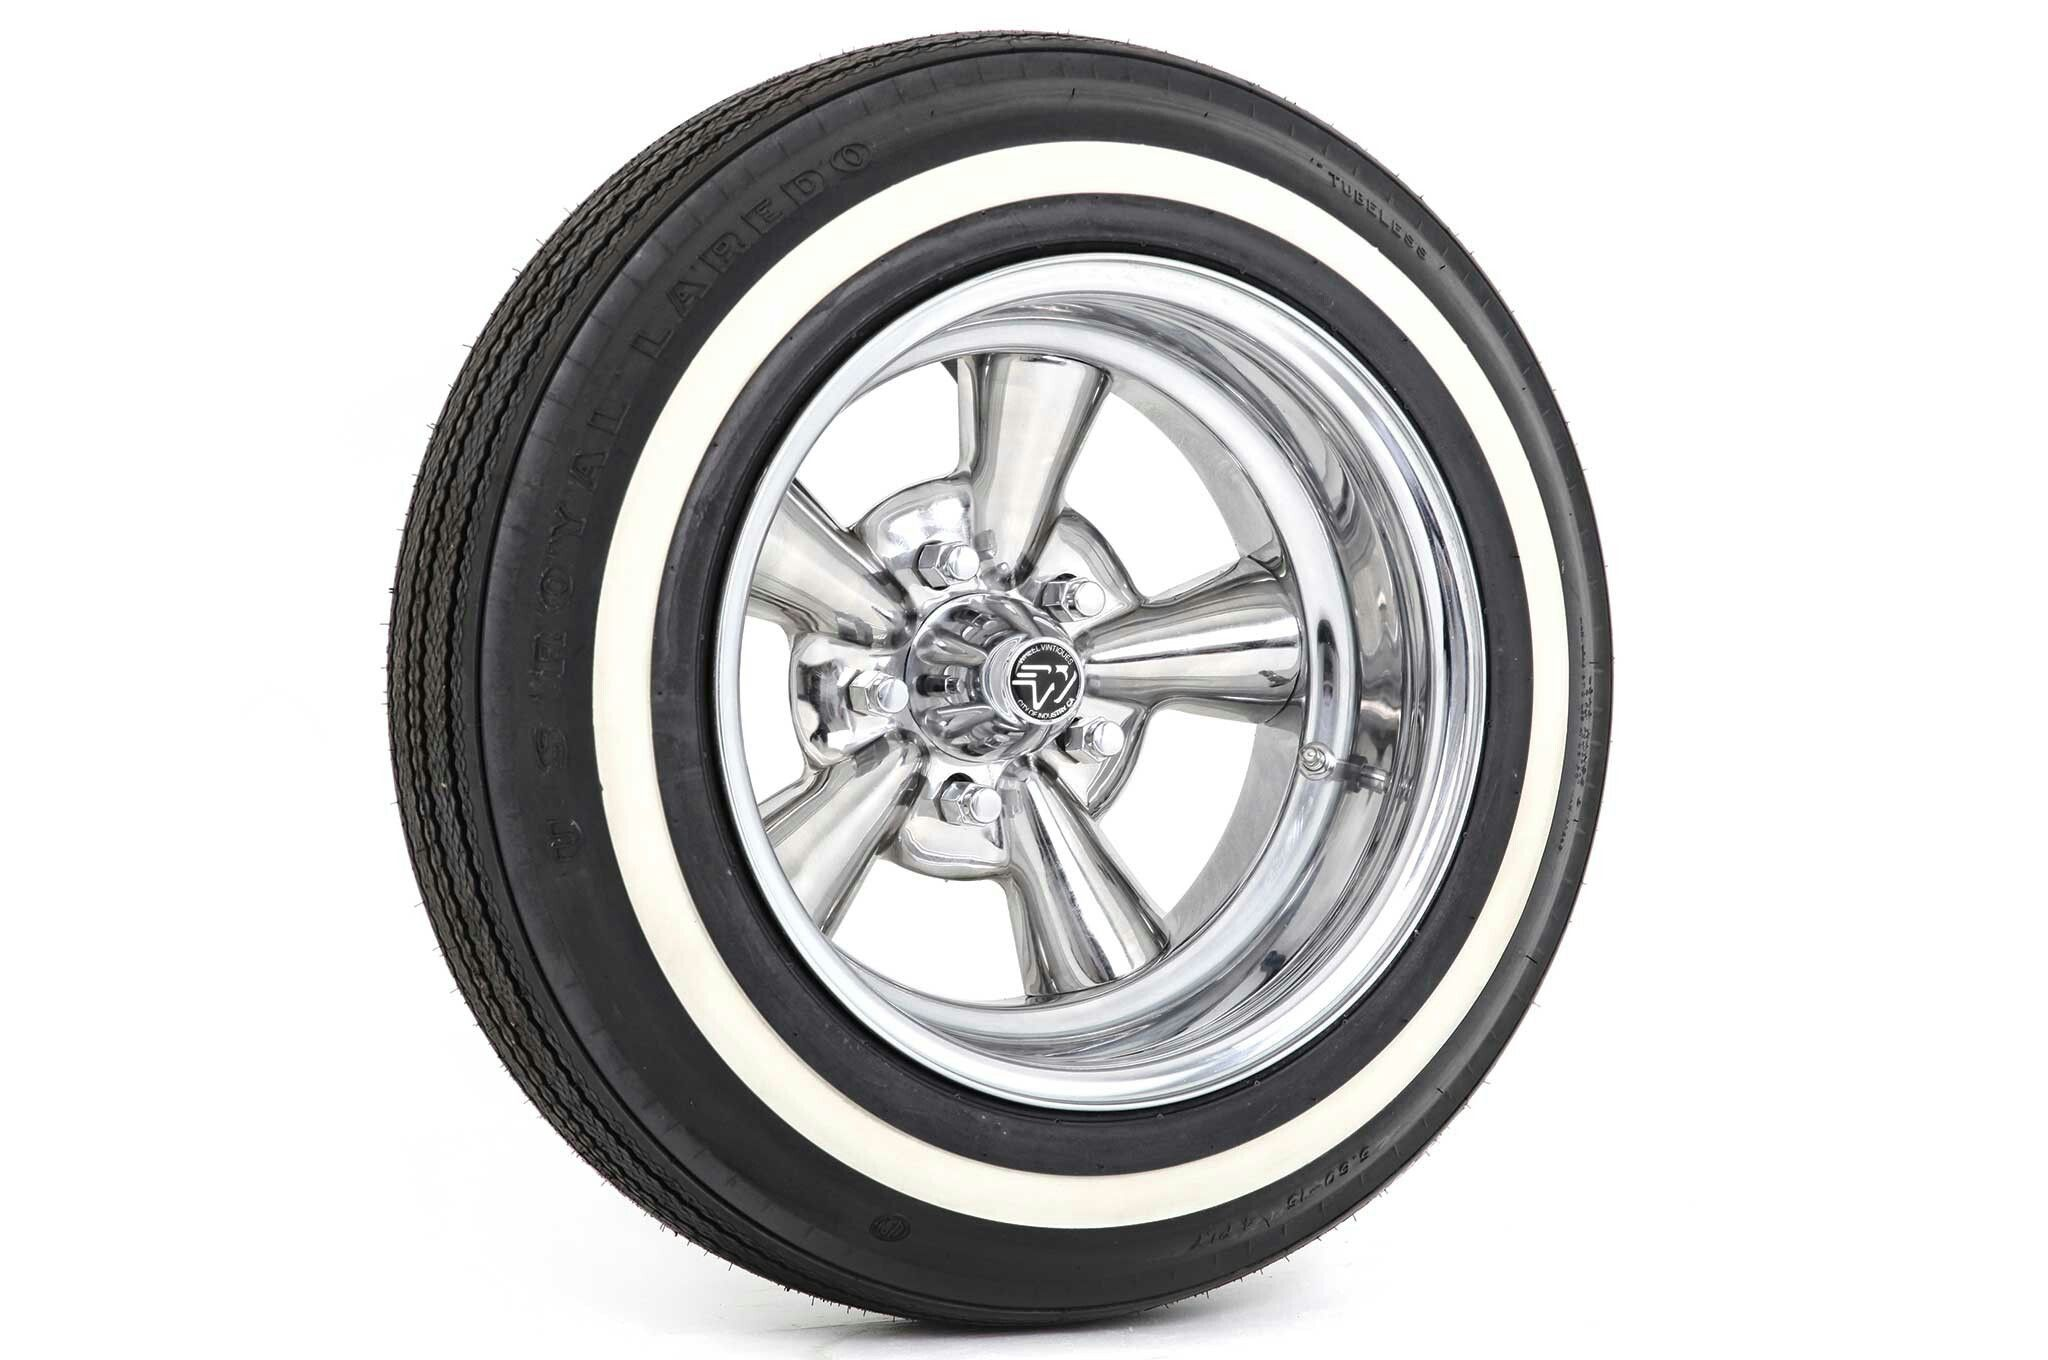 Astro Supreme Half Inch White Wall Wheel Coker Tire Wheels And Tires